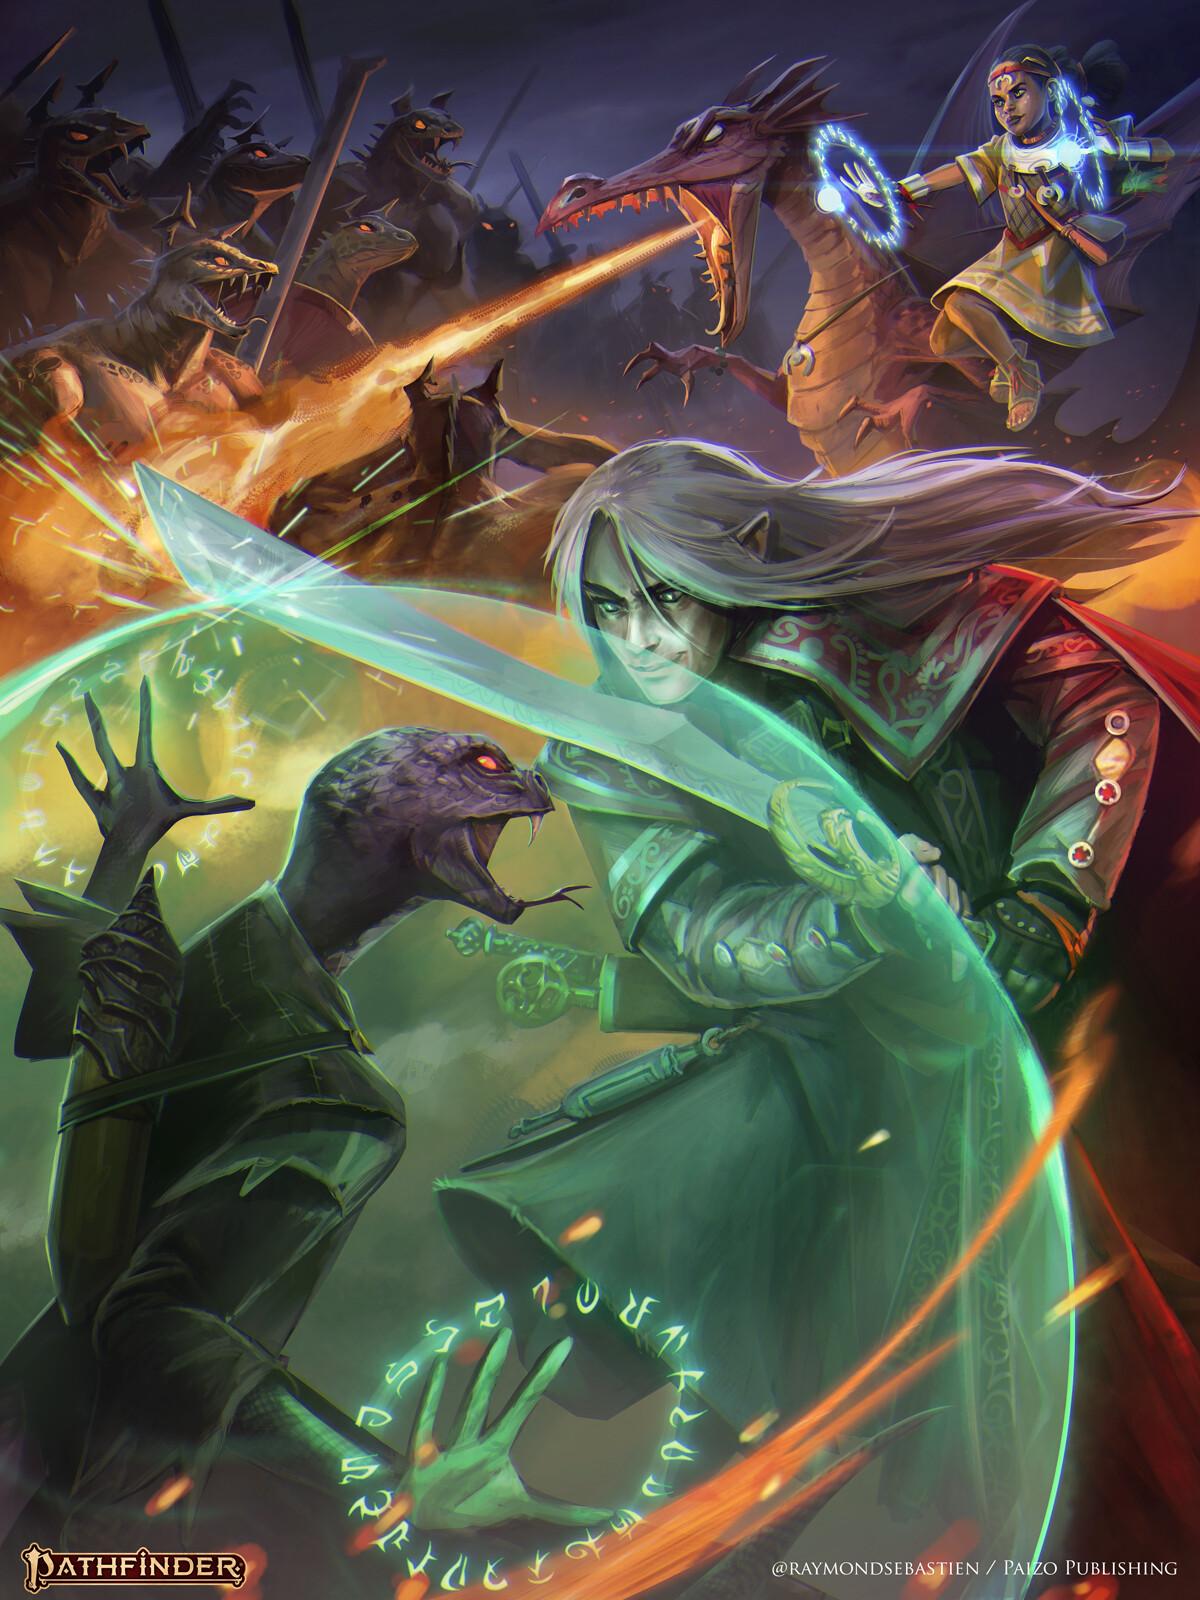 Pathfinder : Secret of magic artwork